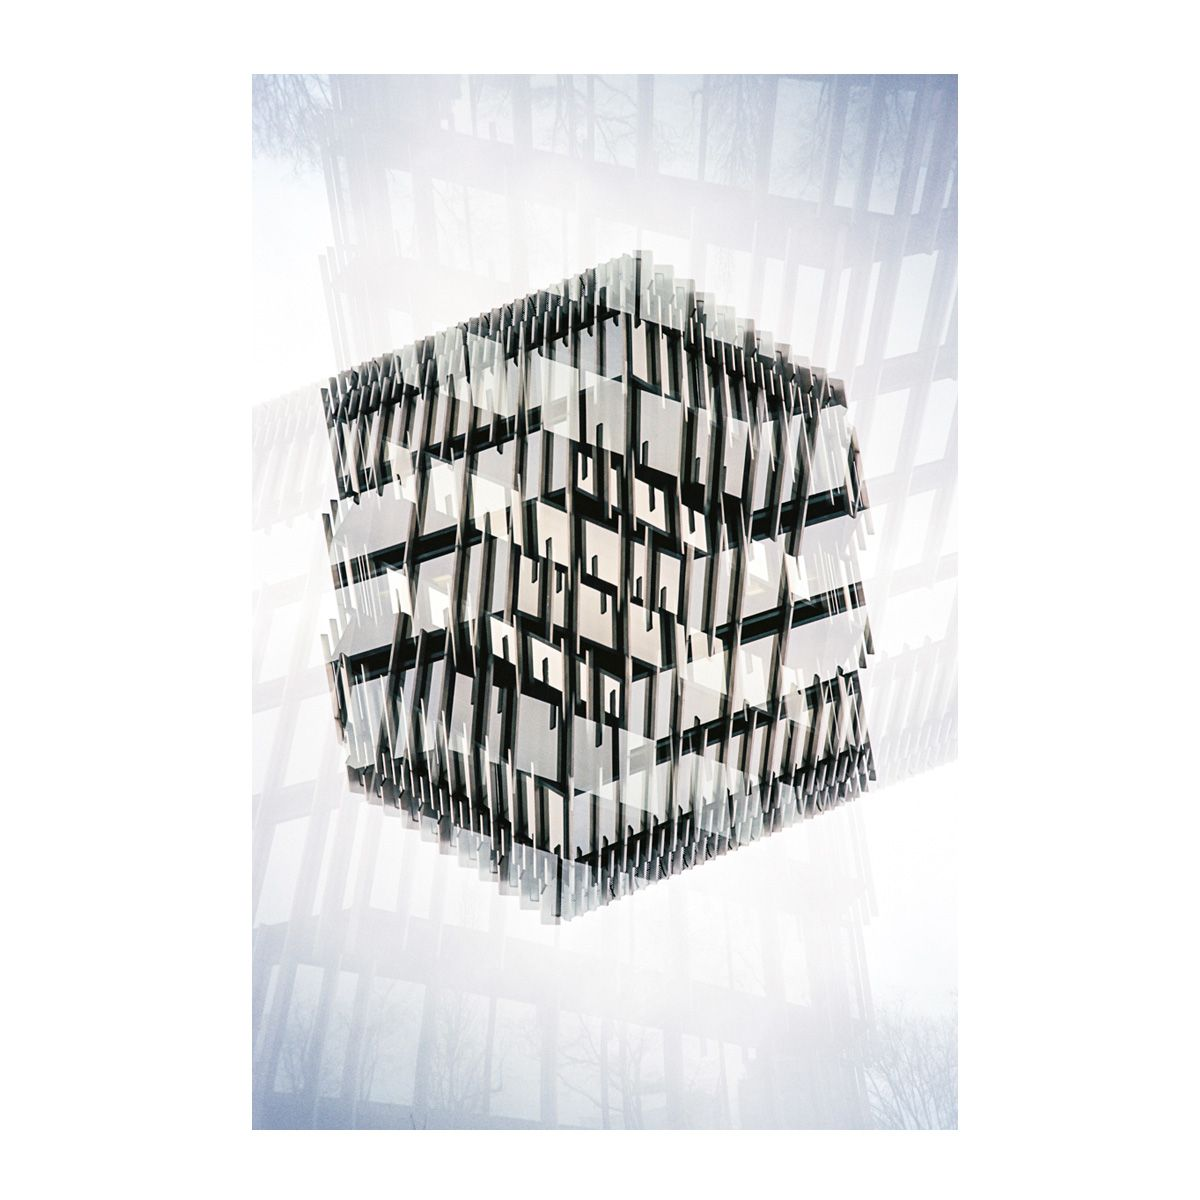 PRE-FORM - Arnau Rovira-02-web